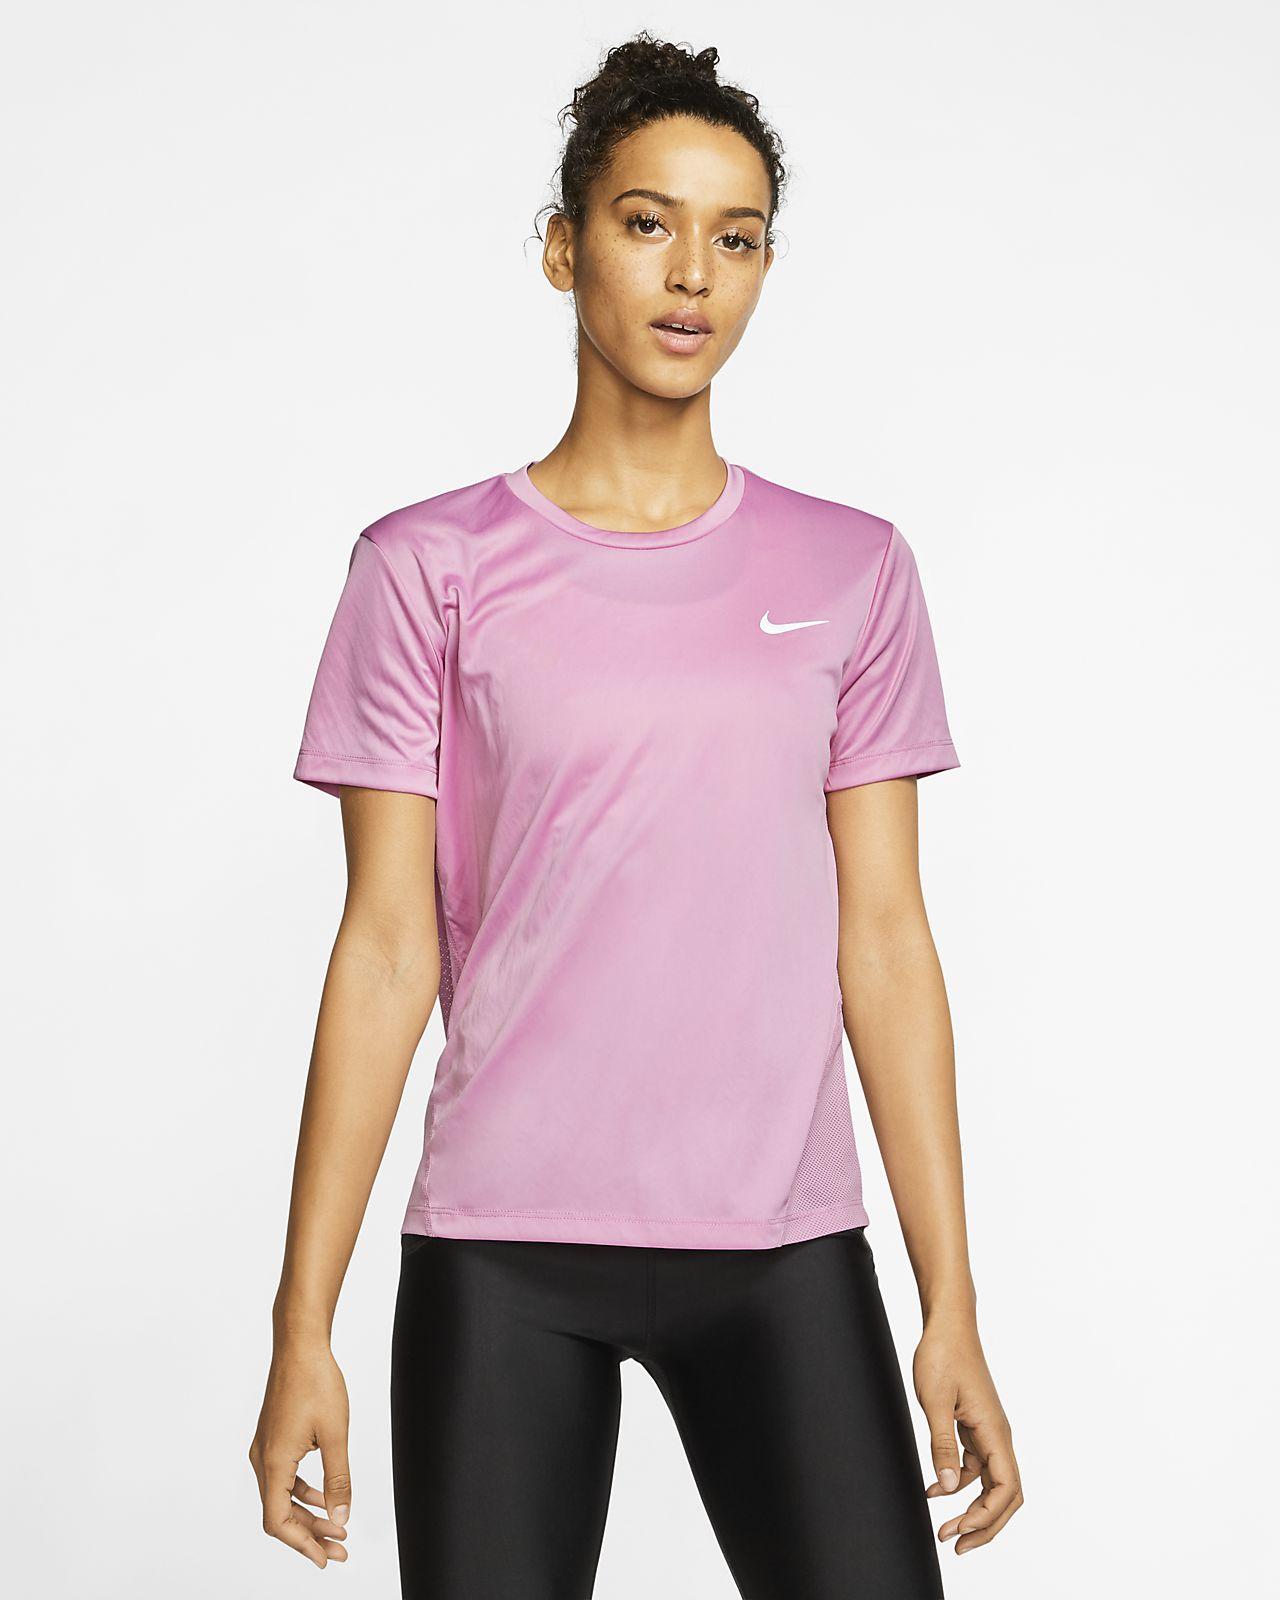 Nike Miler Women's Short Sleeve Running Top